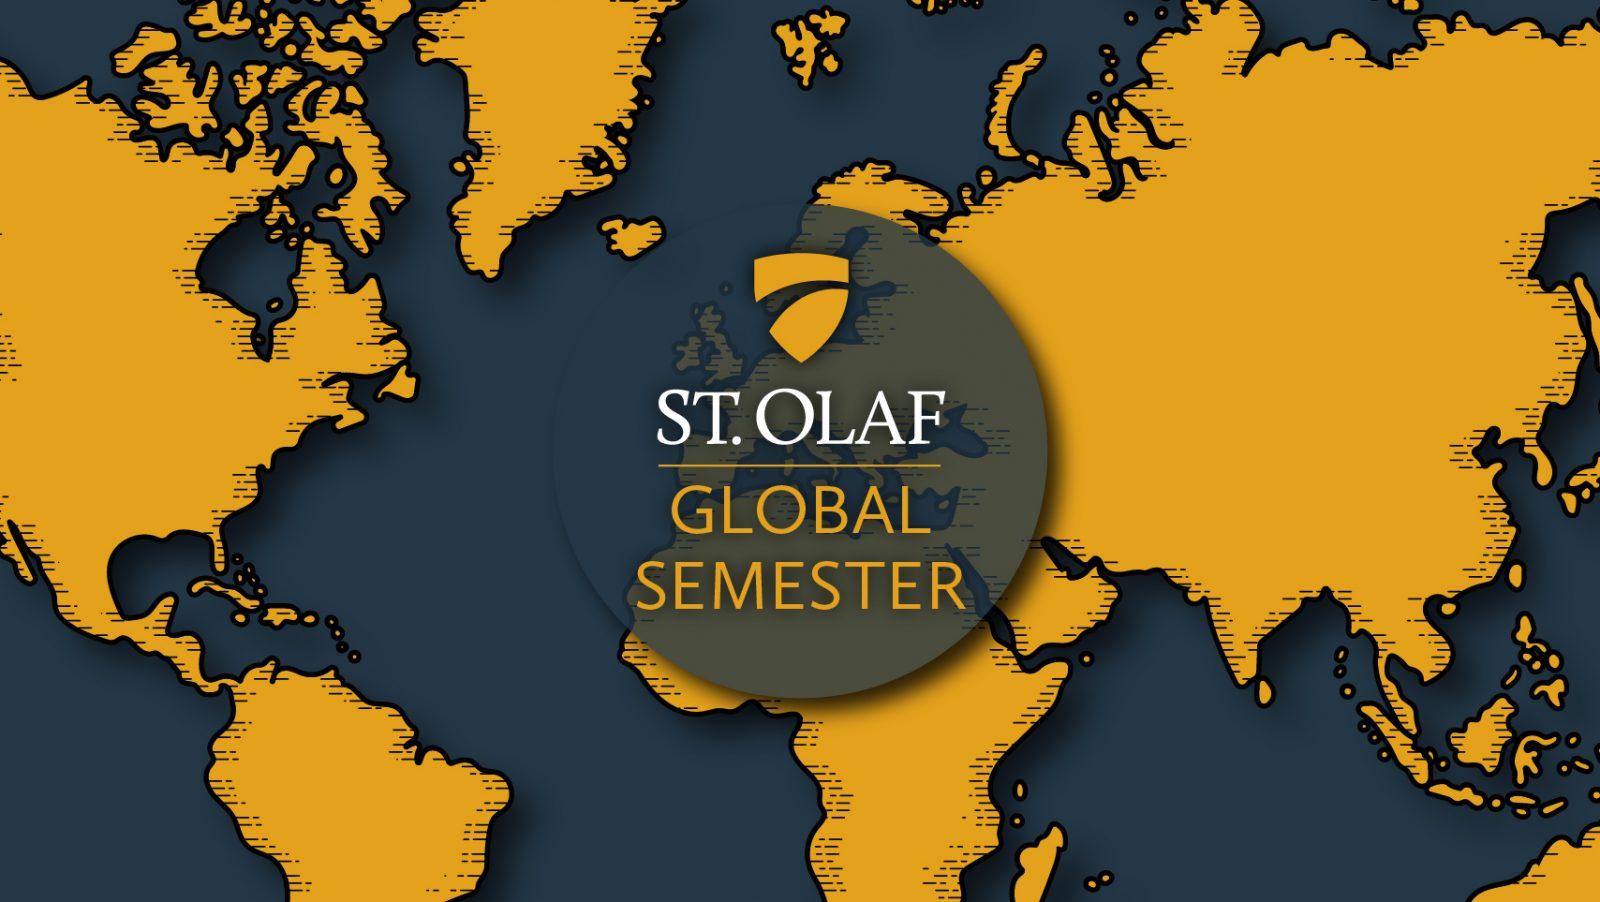 Global-Semester_Map-Graphic_v1